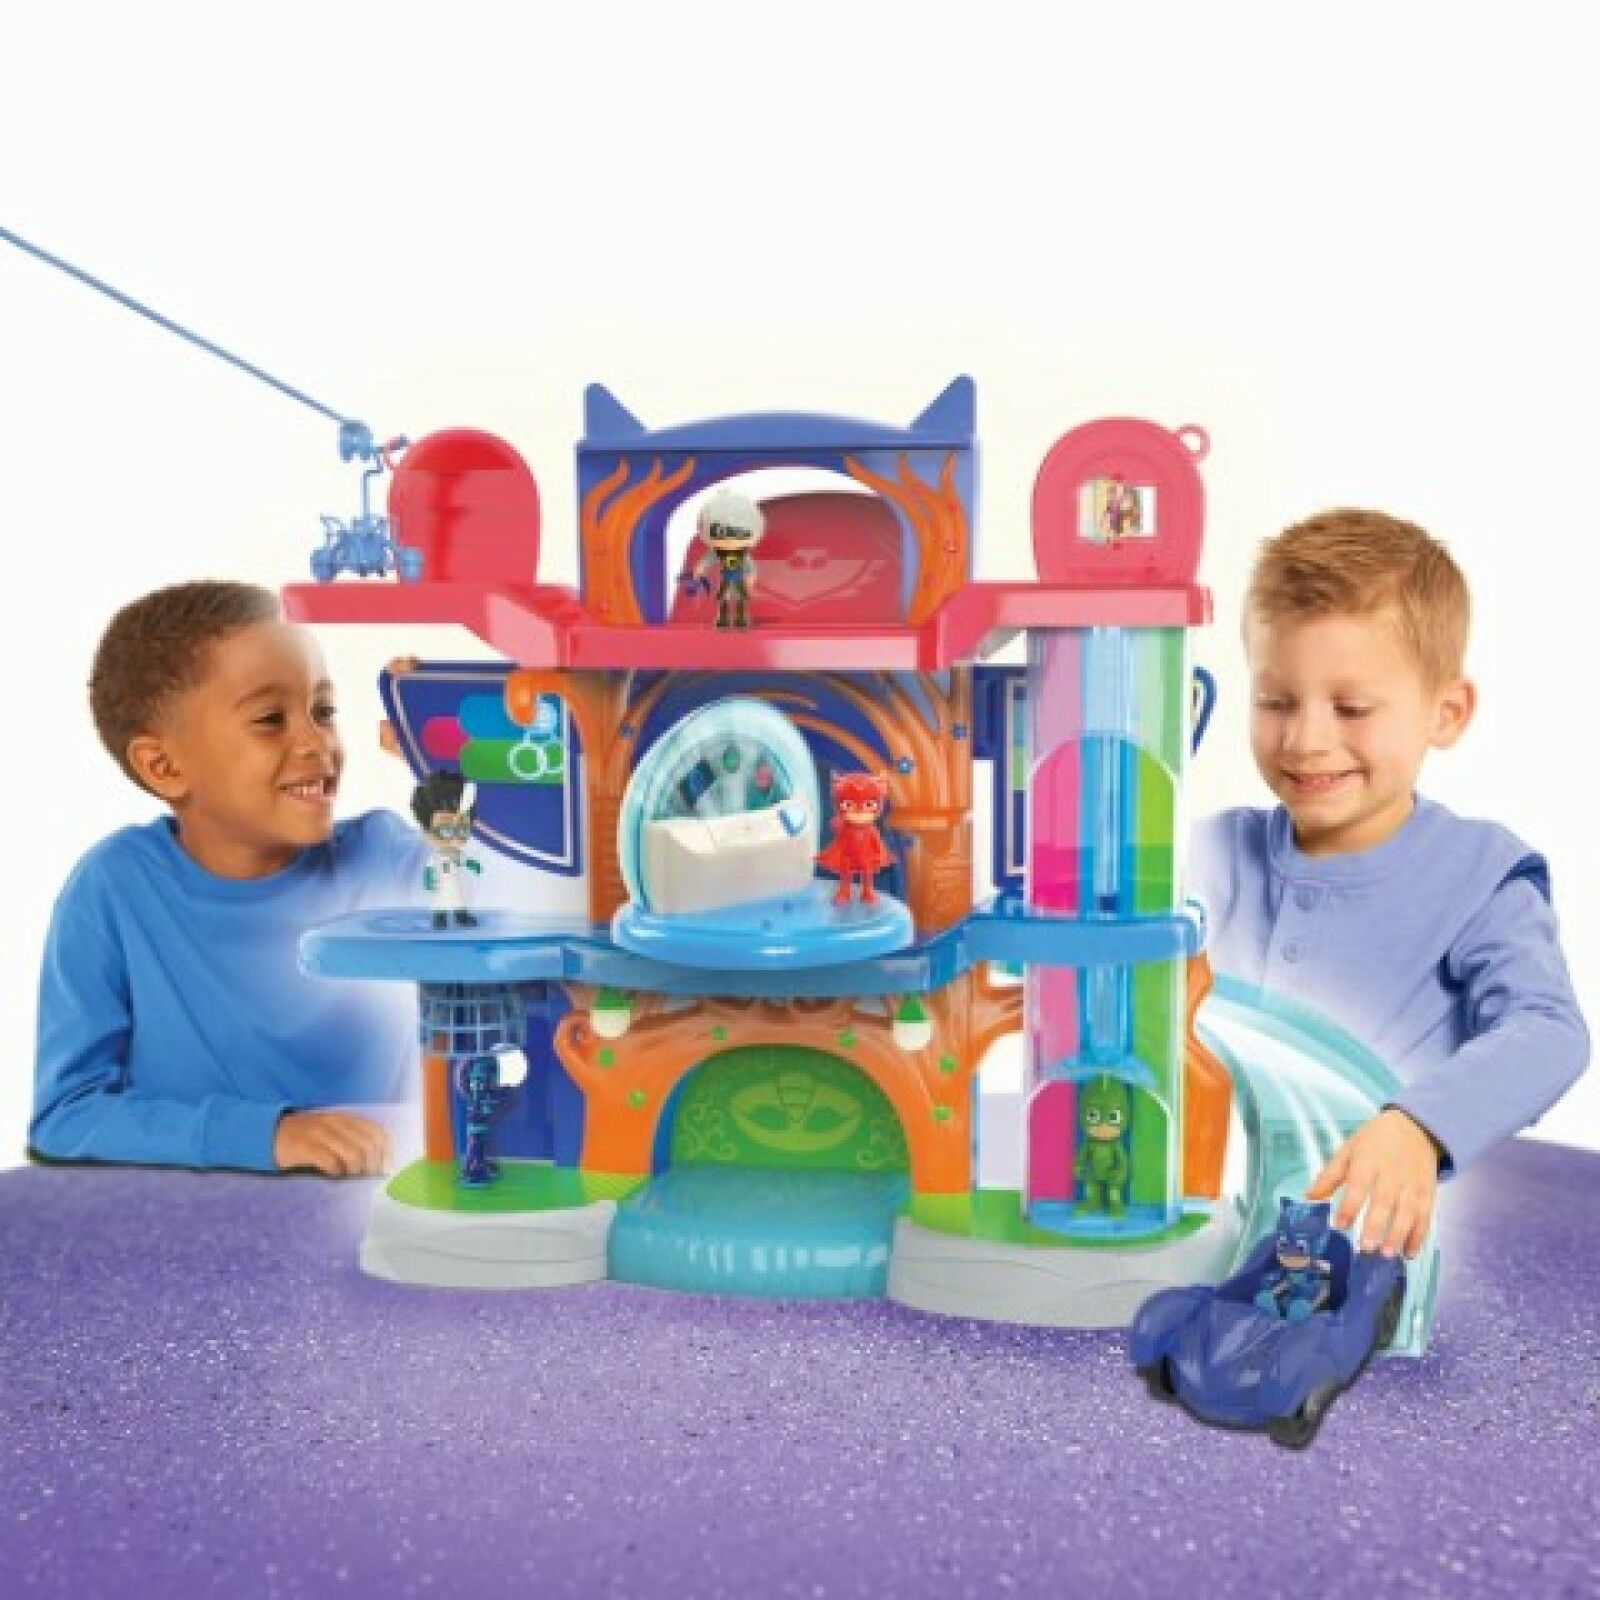 PJ Masks Headquarter Play Set Toy Catboy Car Figure Cat New Kids Rescue Center